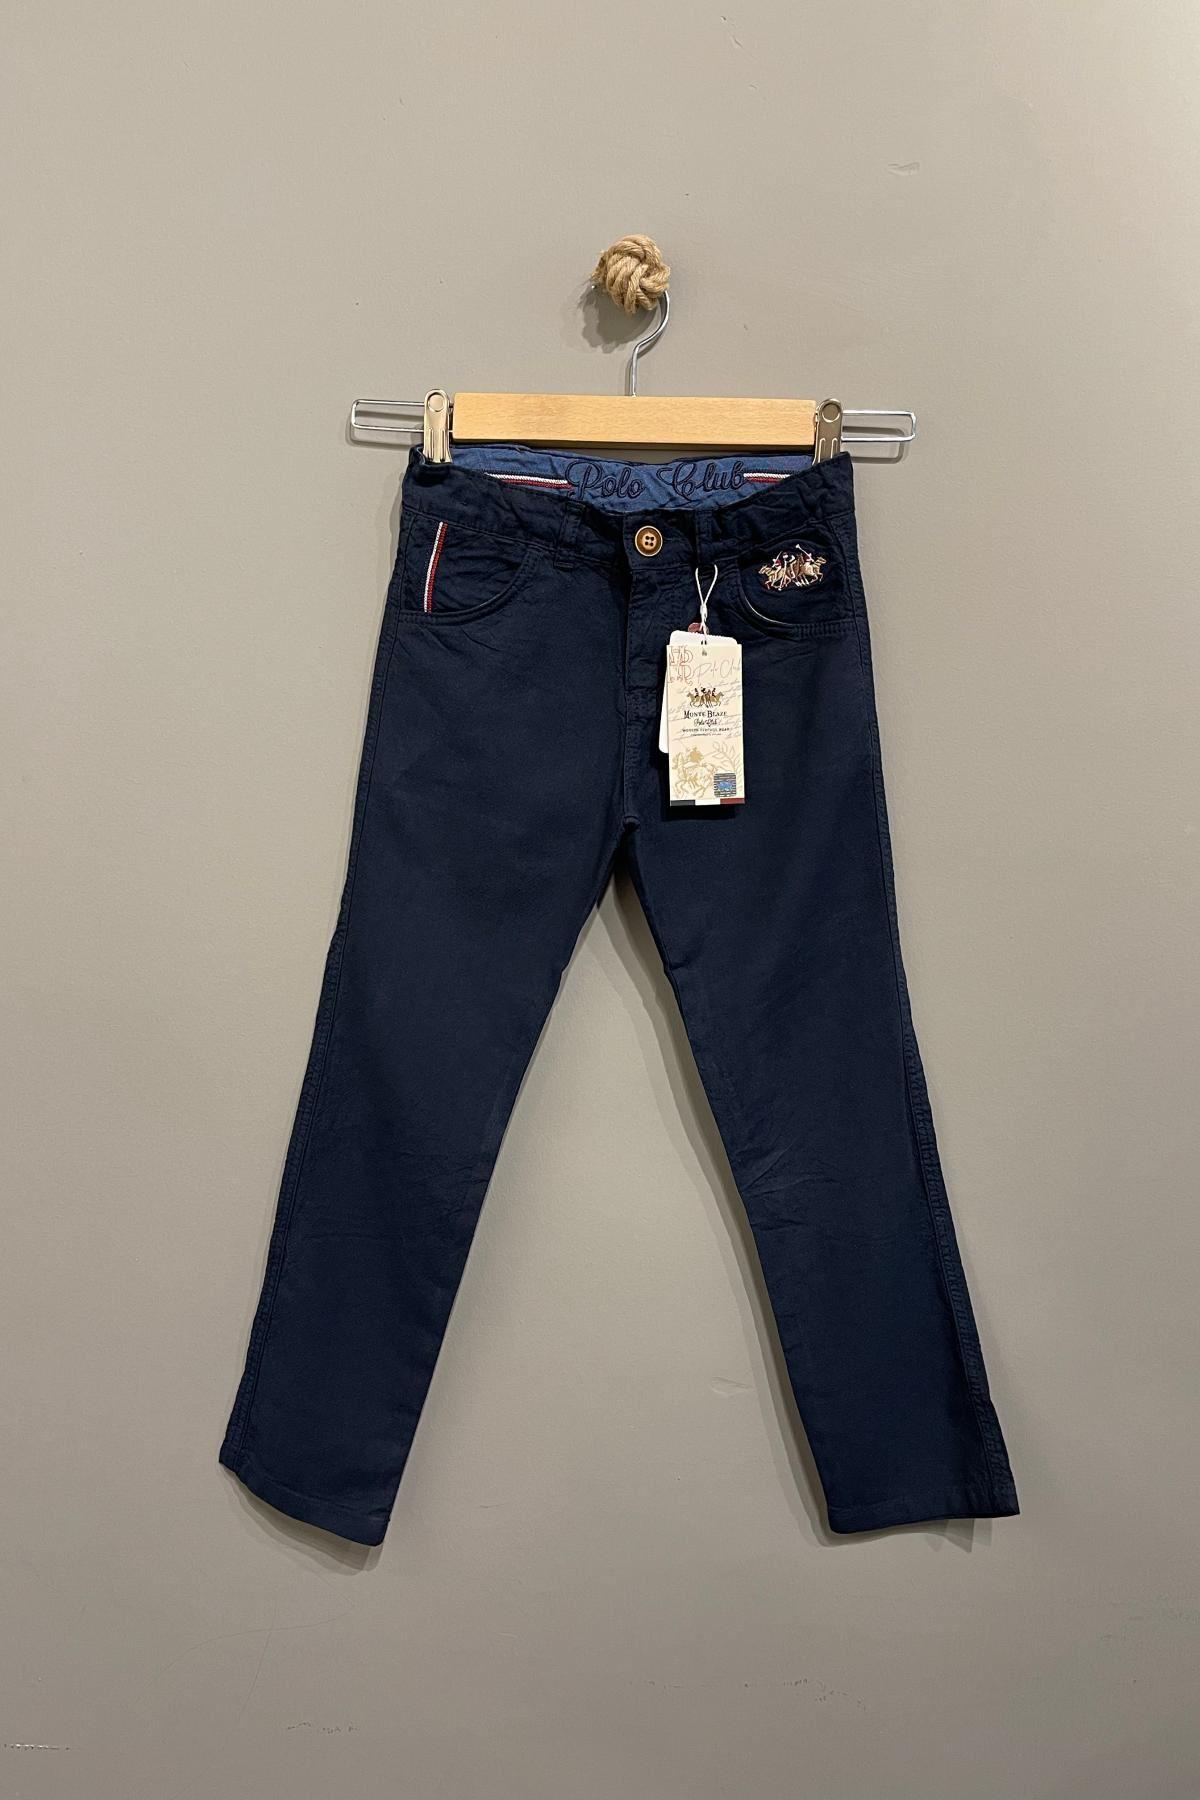 Monte Blaze Pantolon - Laci